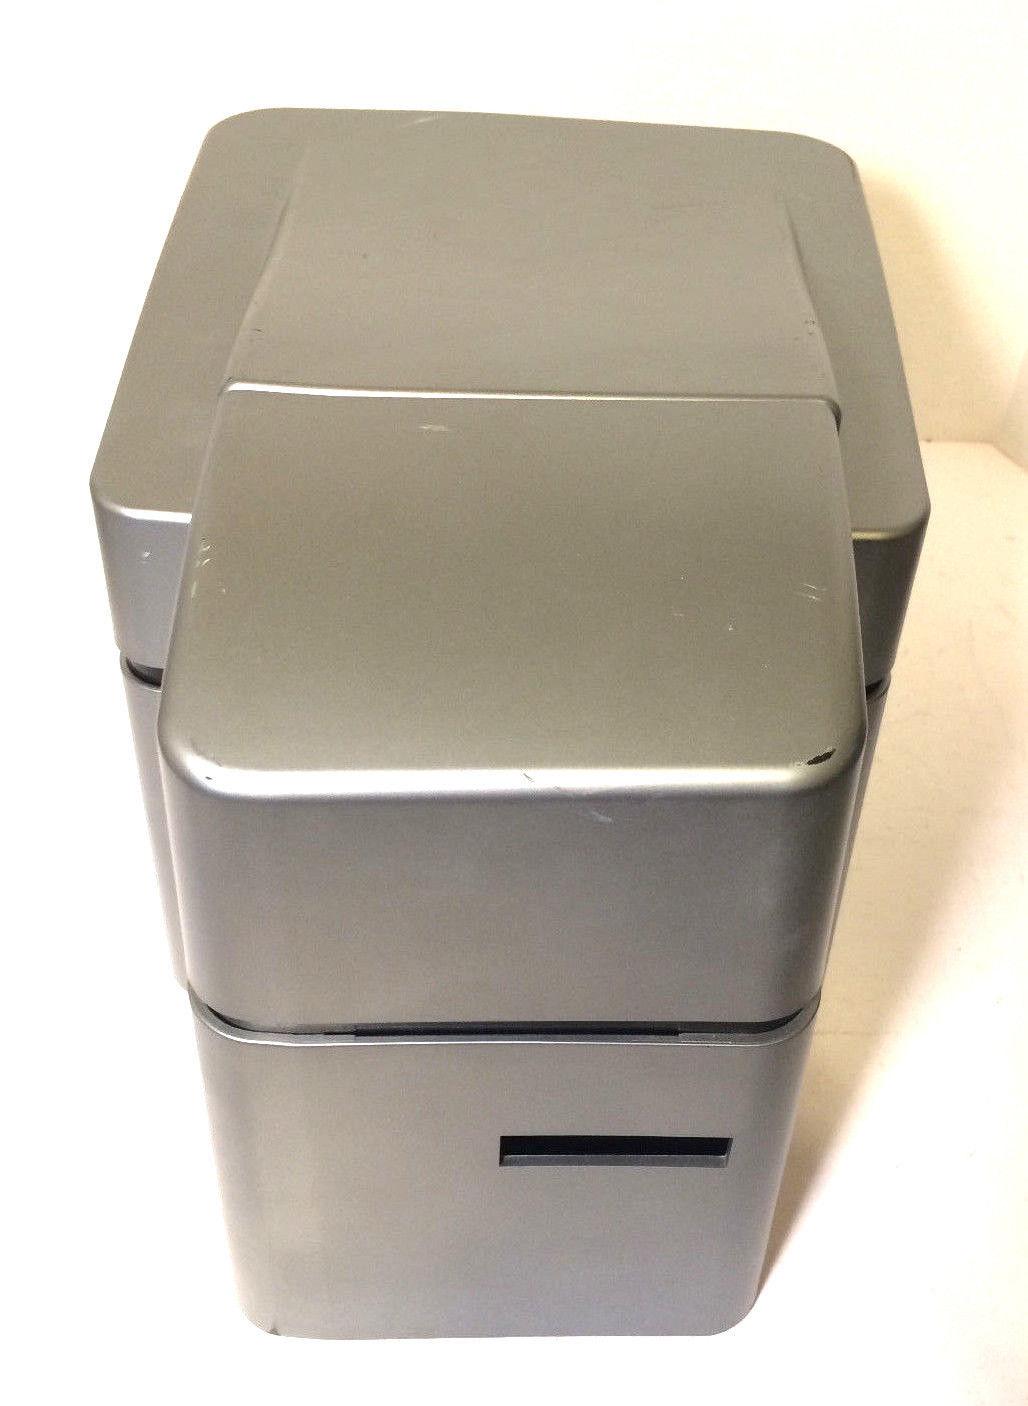 HID Fargo DTC1000 Dual Sided ID Card Printer USB 47100 Tested